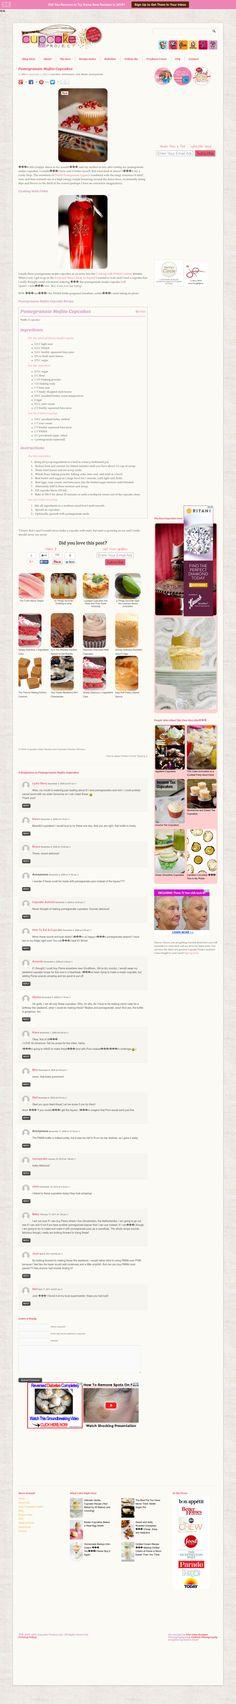 CupcakeProject.com/***Pomegranate Mojito Cupcakes